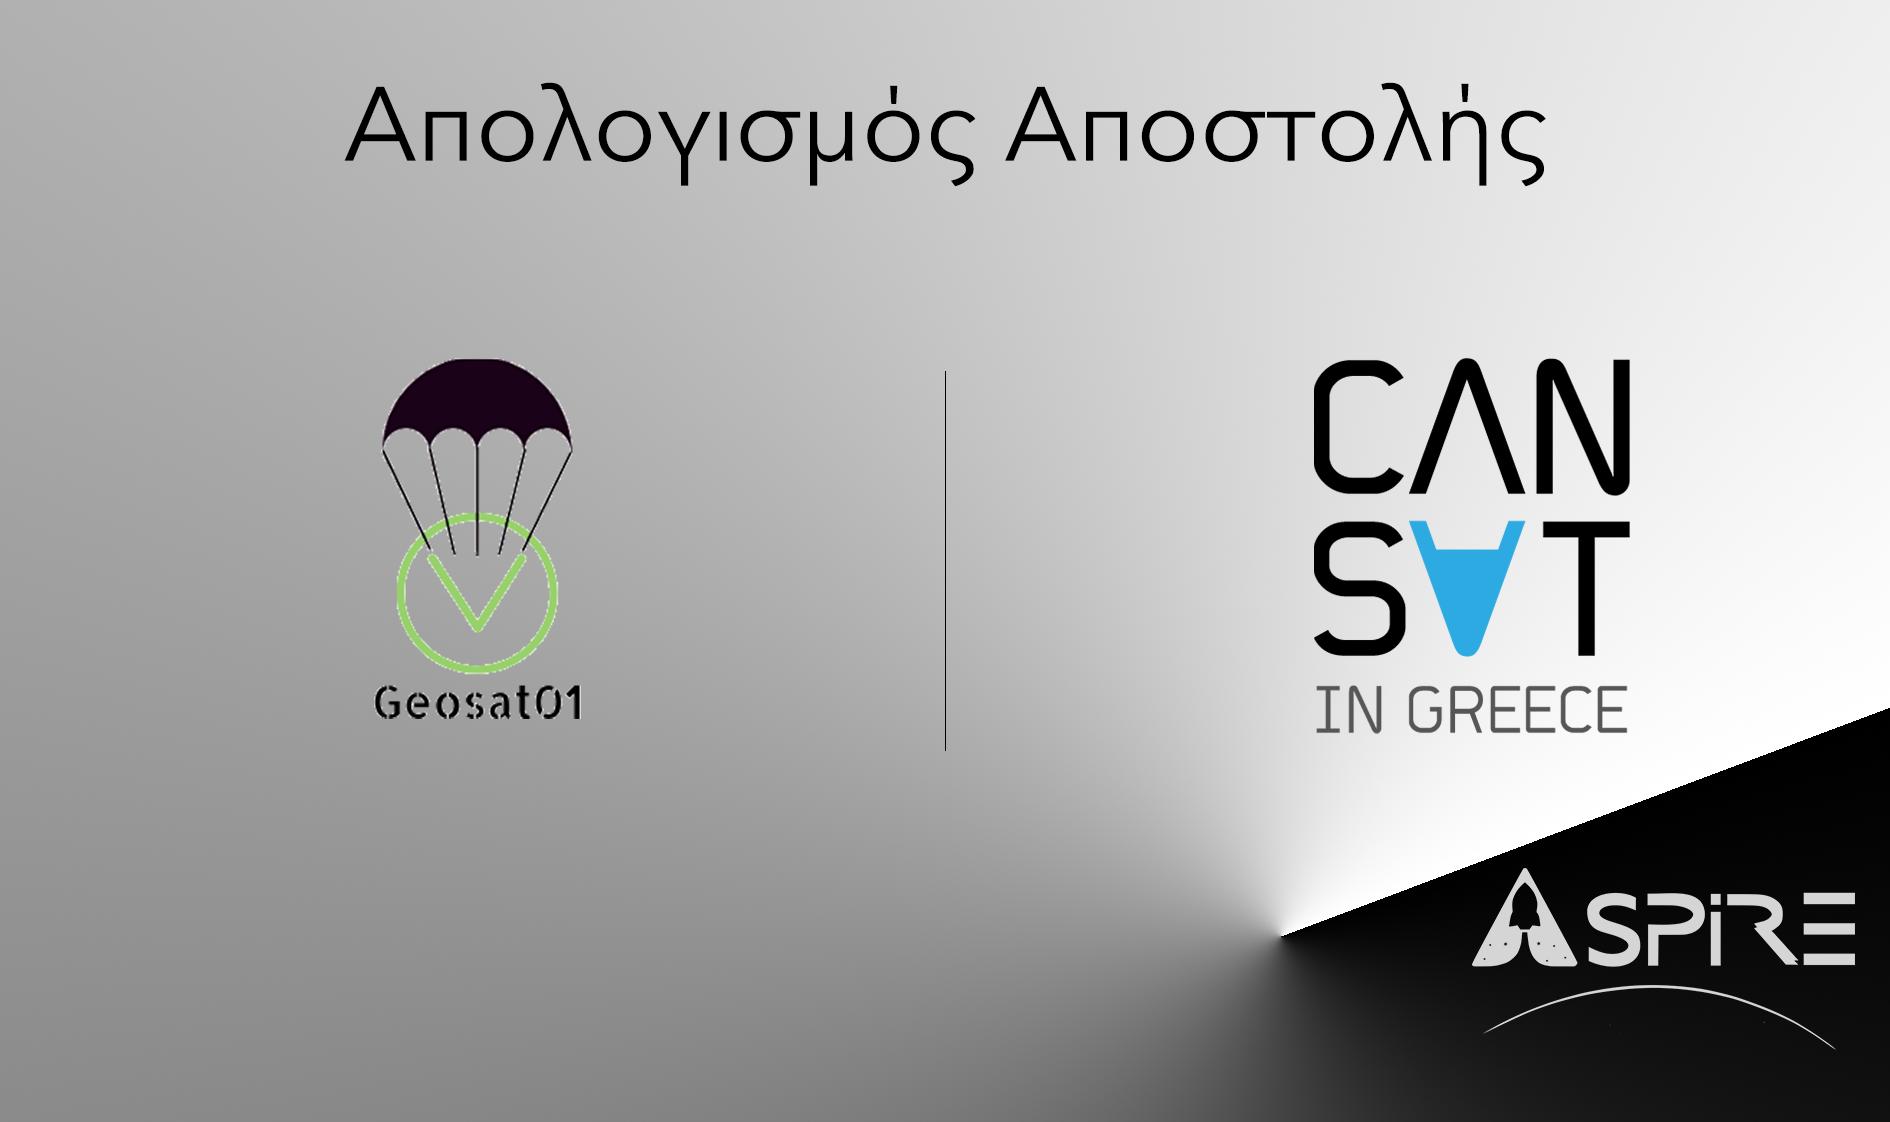 CanSat in Greece 2019: Απολογισμός Αποστολής